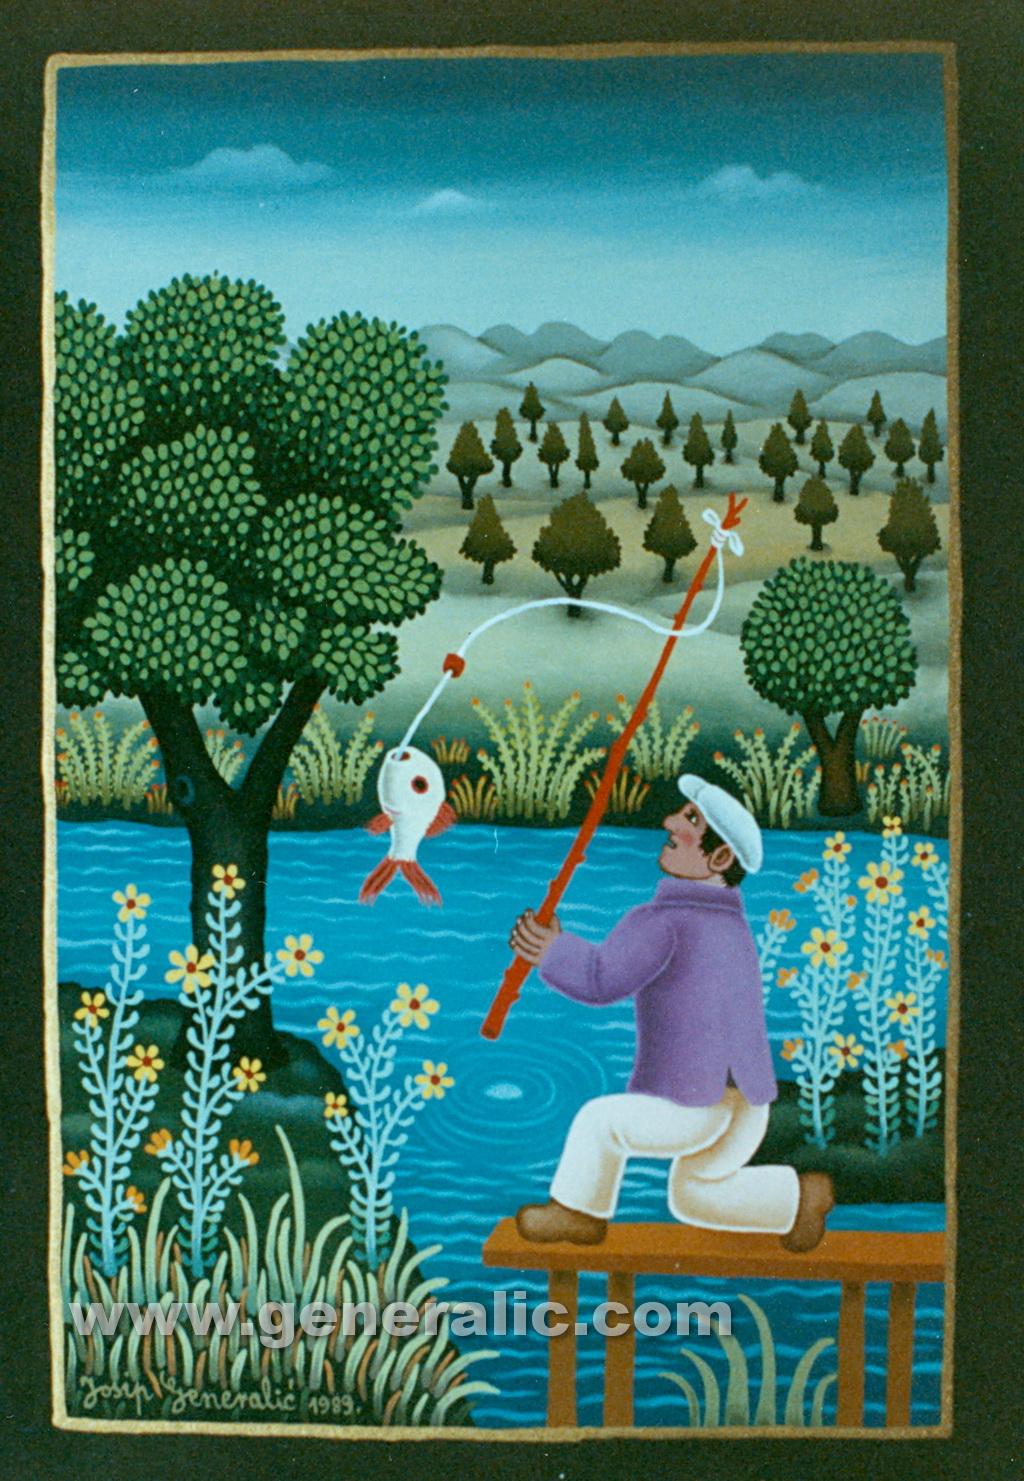 Josip Generalic, 1989, Fisherman with white fish, oil on glass